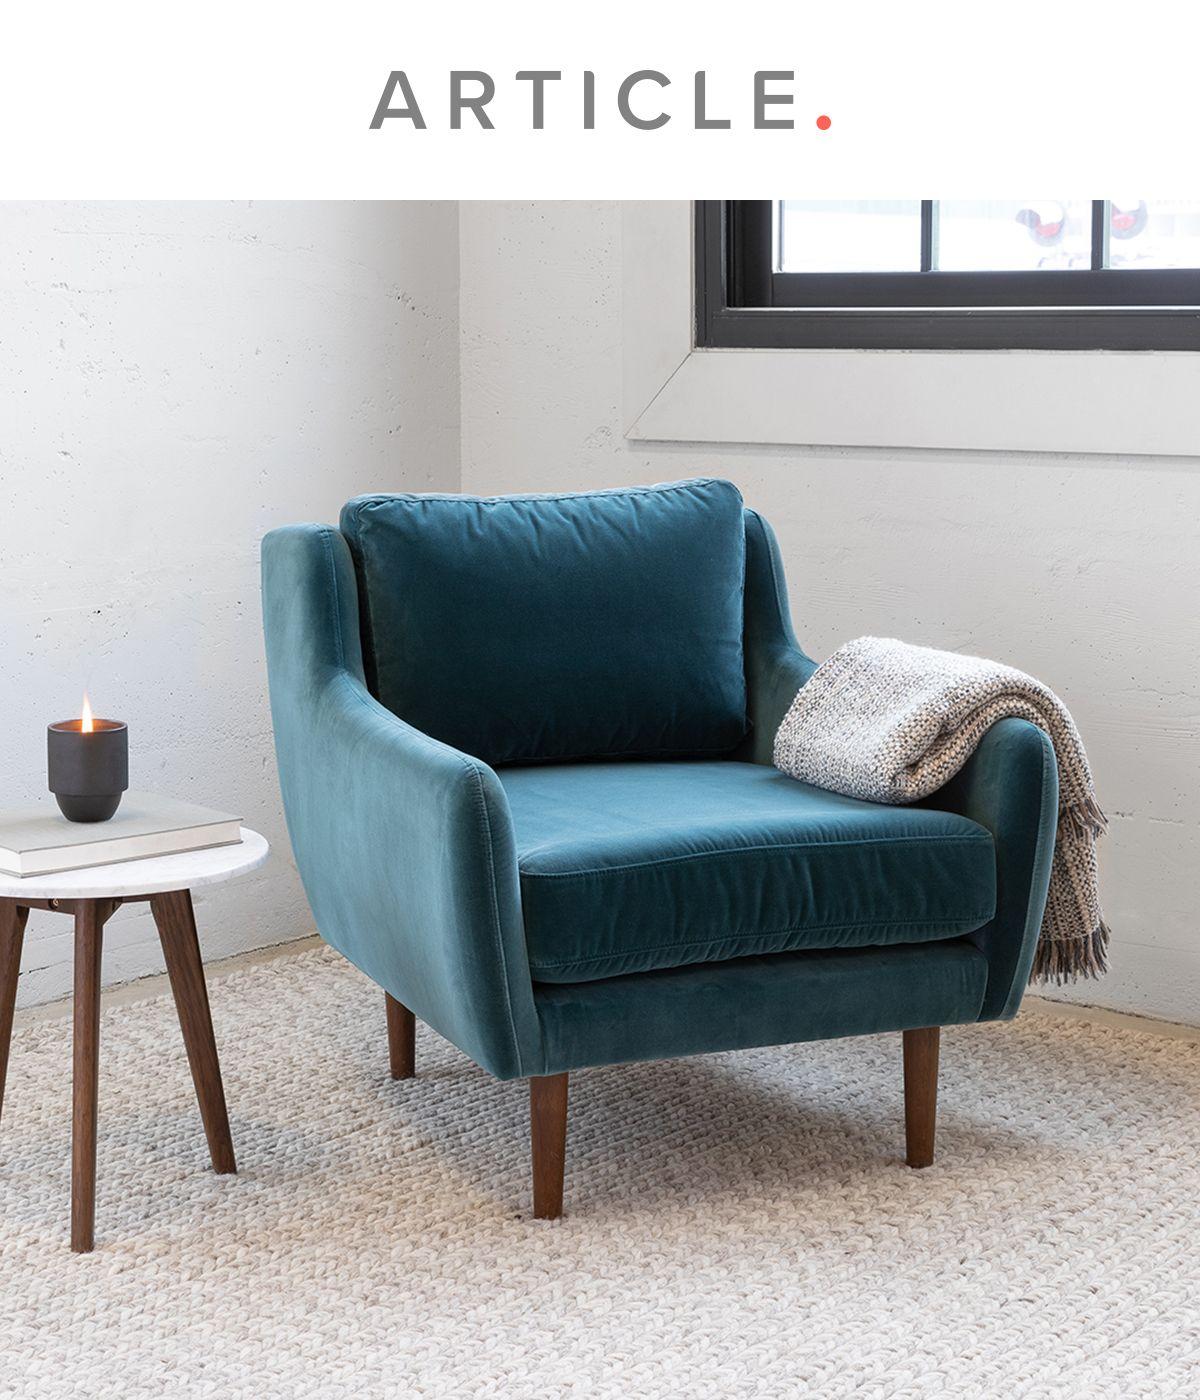 Matrix Pacific Blue Chair In 2020 Blue Chairs Living Room Velvet Chairs Living Room Blue Accent Chairs #turquoise #chairs #for #living #room